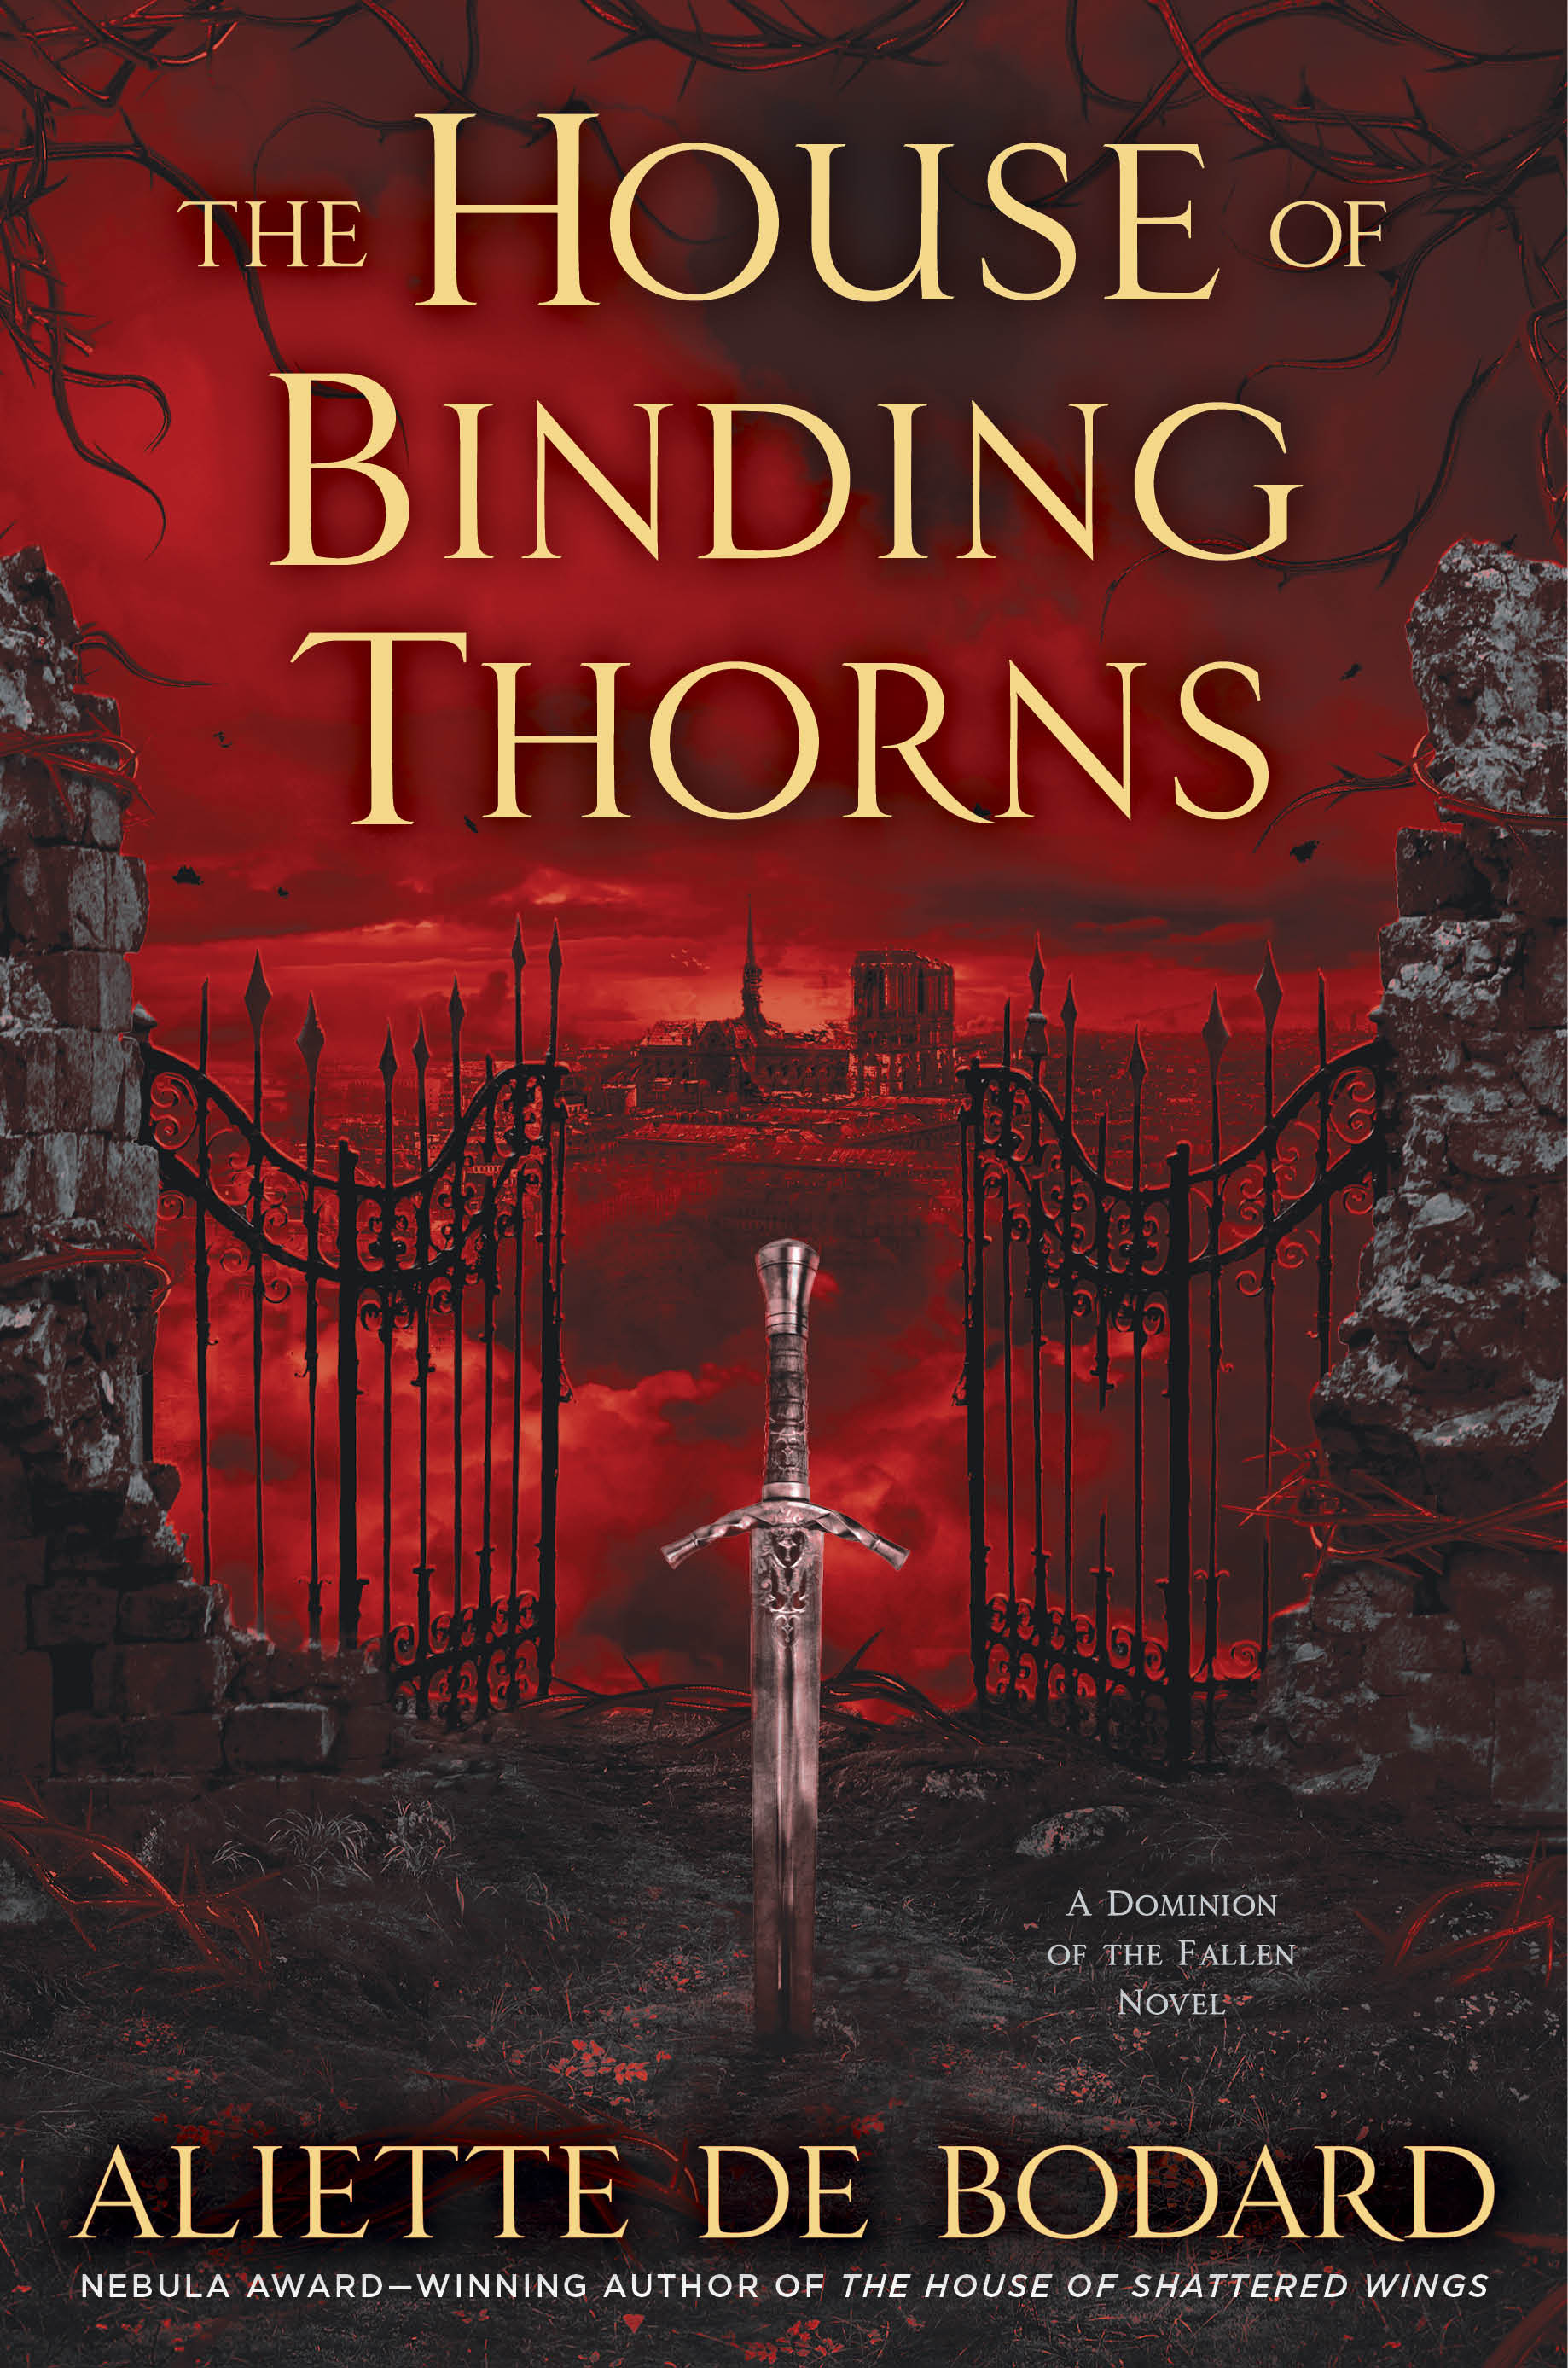 House-of-Binding-Thorns.jpg